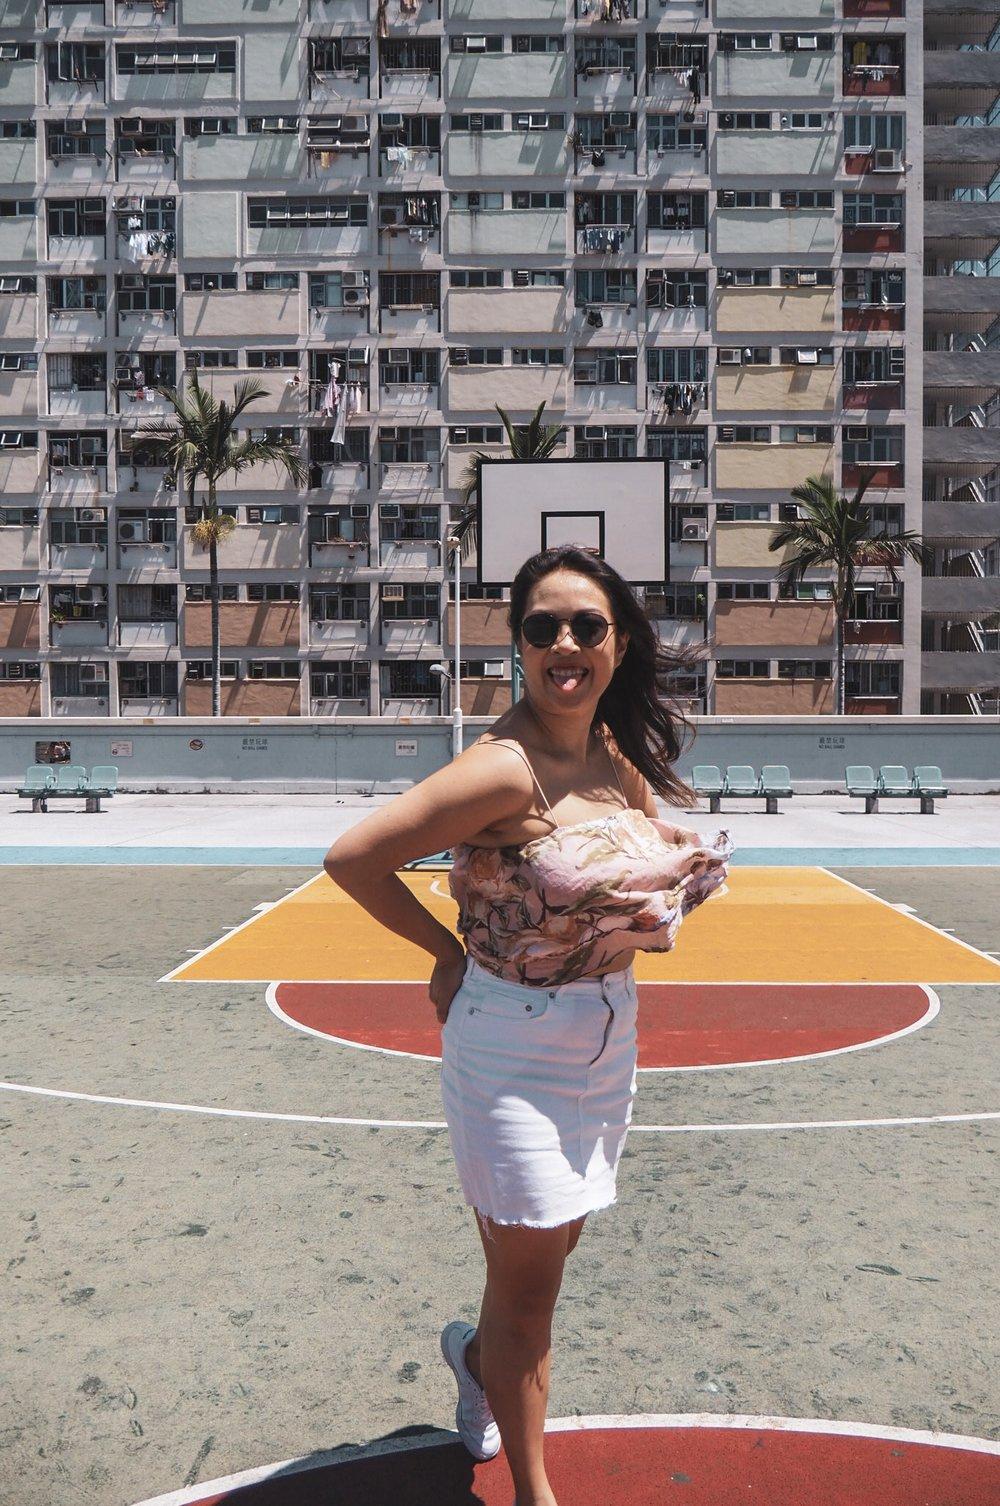 hong kong colourful basketball court.jpg